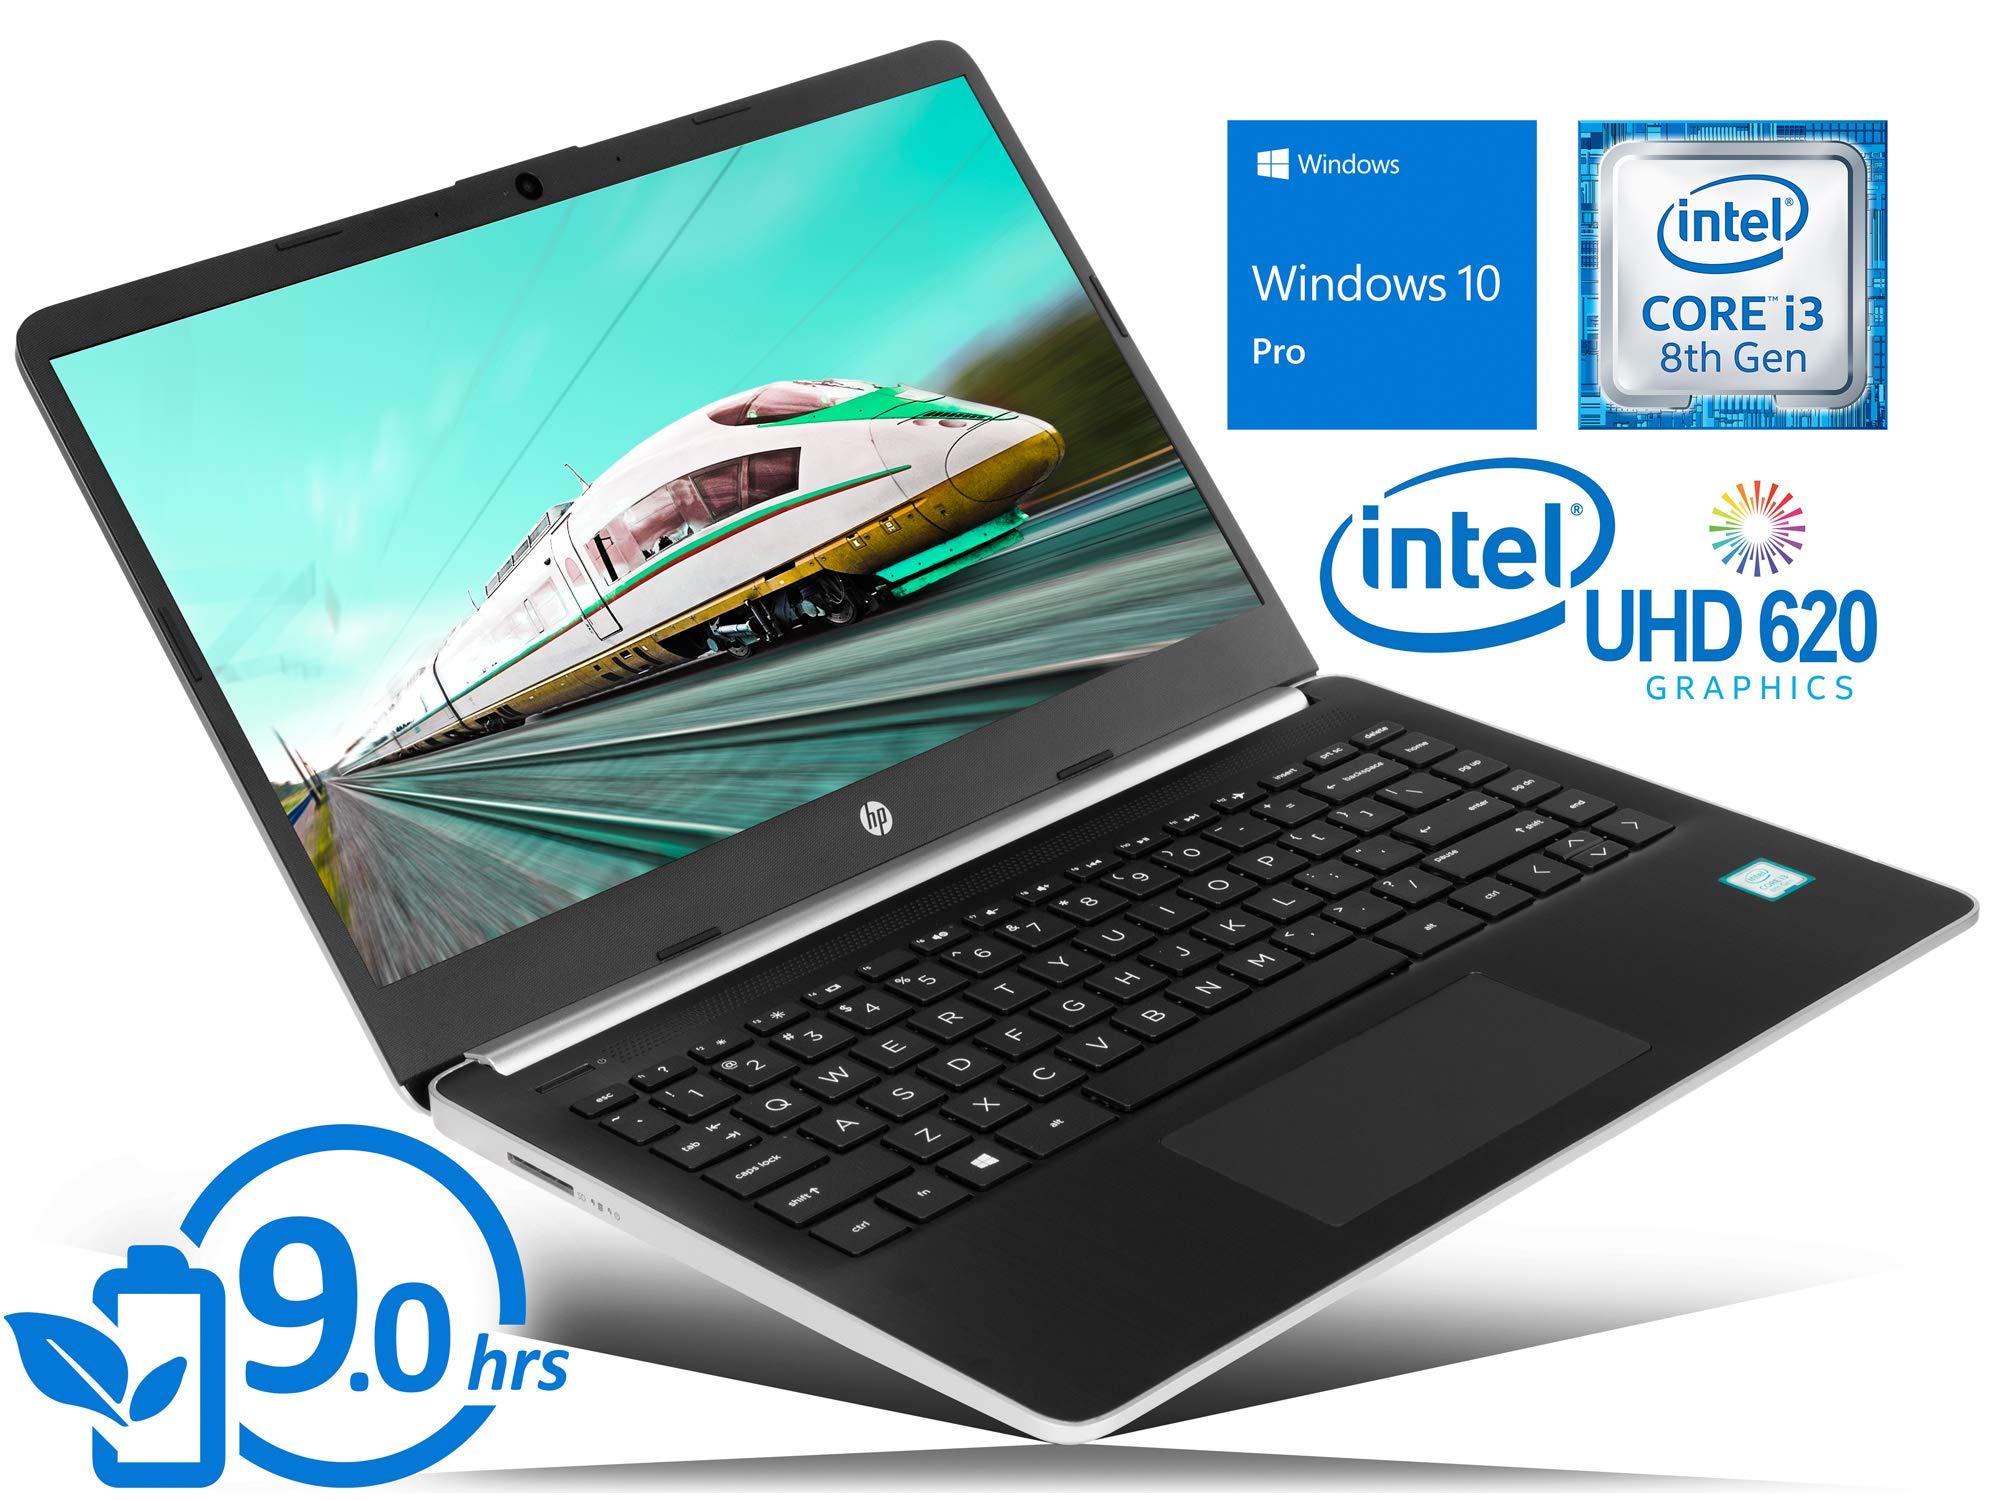 "HP 14 Laptop, 14"" HD Display, Intel Core i5-1035G1 Upto 3.6GHz, 16GB RAM, 256GB NVMe SSD, HDMI, Card Reader, Wi-Fi, Bluetooth, Windows 10 Pro"